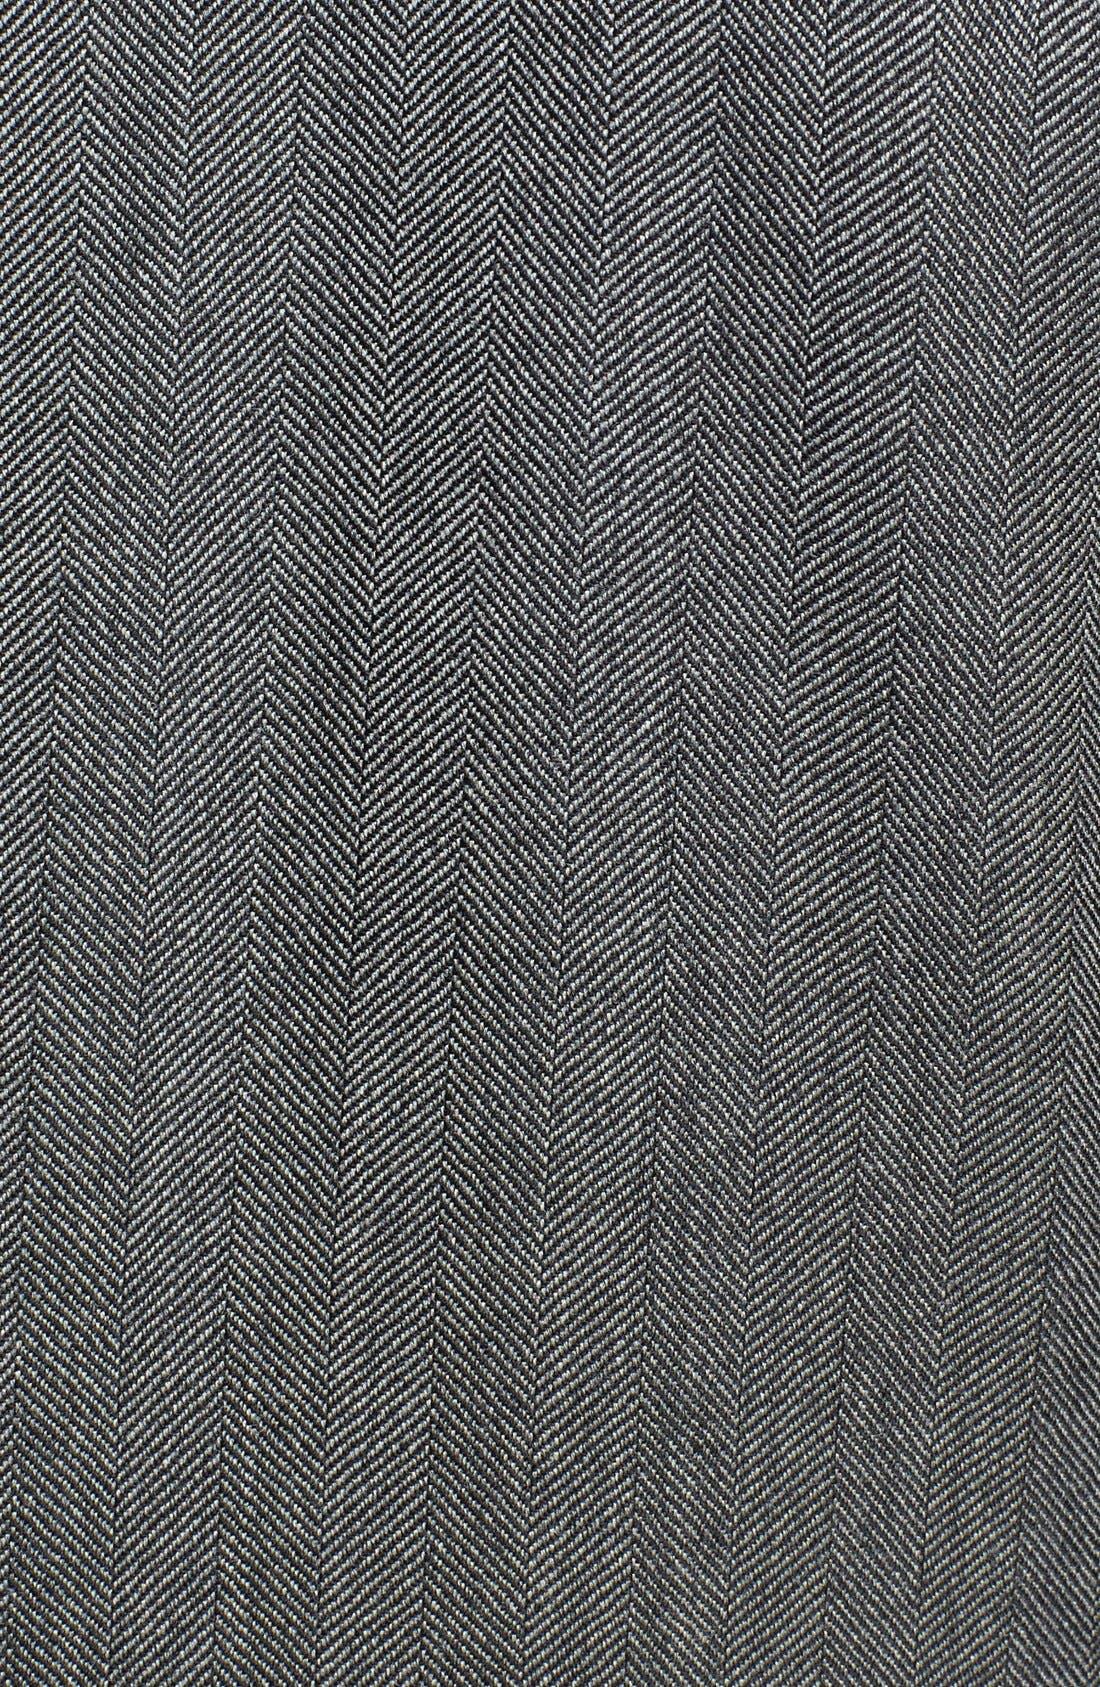 ZZDNUHUGO BOSS, HUGO 'Arux' Trim Fit Herringbone Sport Coat, Alternate thumbnail 4, color, 077